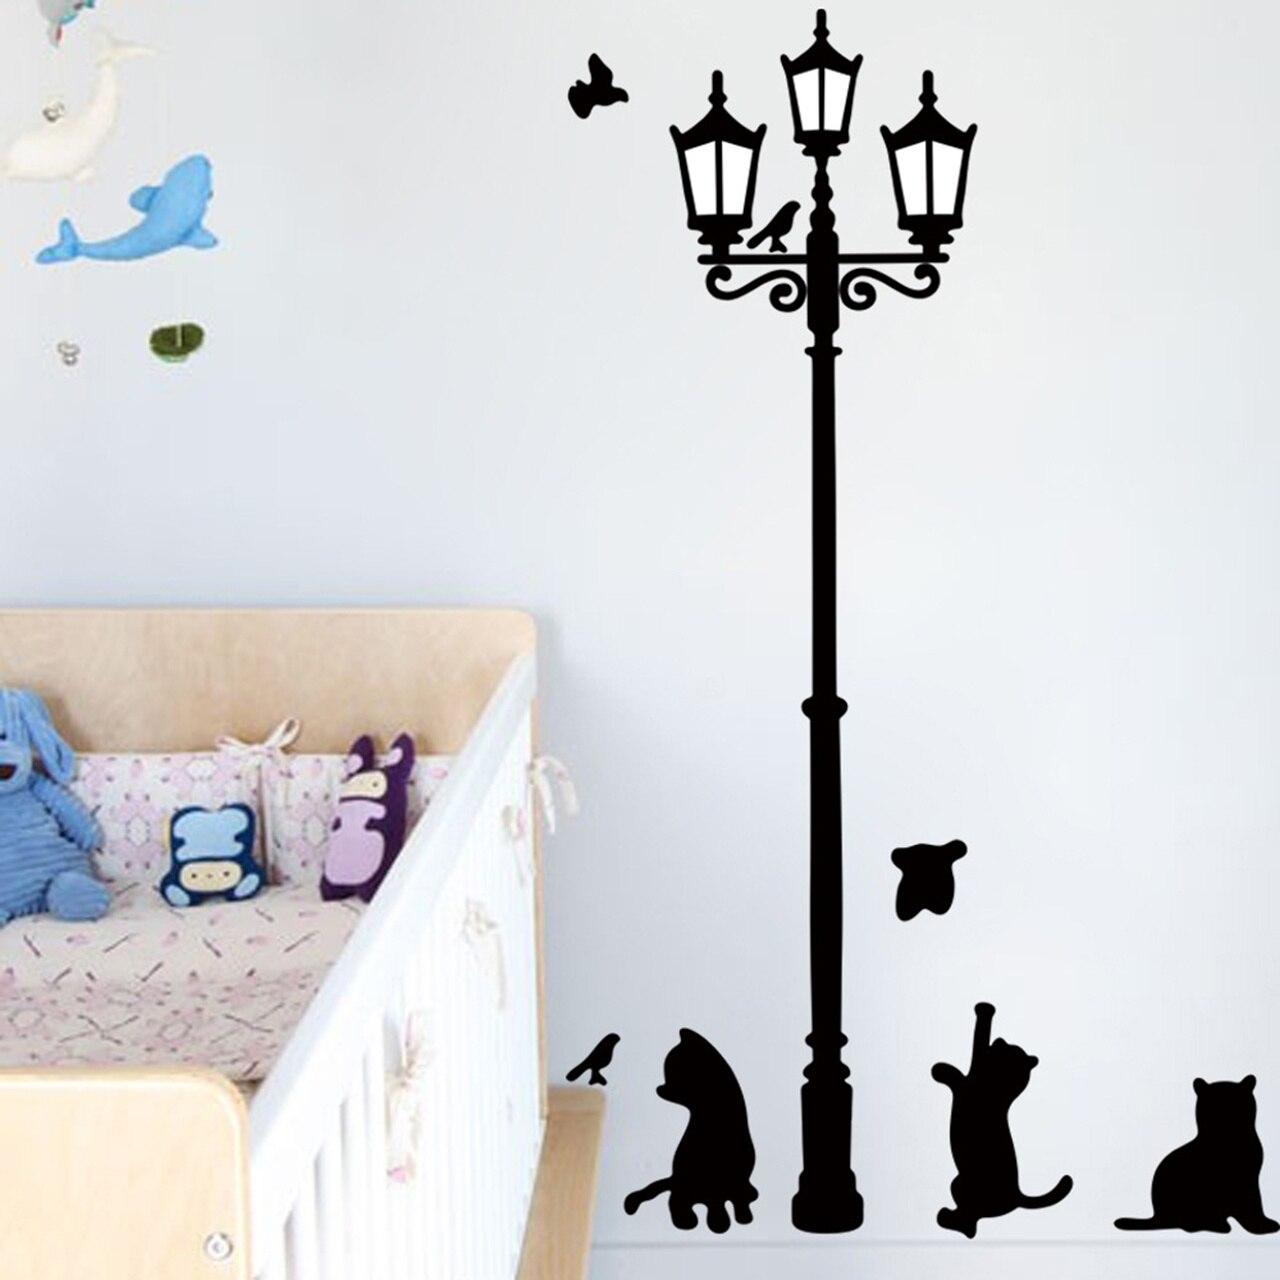 Lamp light wall art decor removable mural vinyl decal sticker purple - Cats Street Lamp Lighs Stickers Wall Decal Removable Art Vinyl Mural Decal Decor China